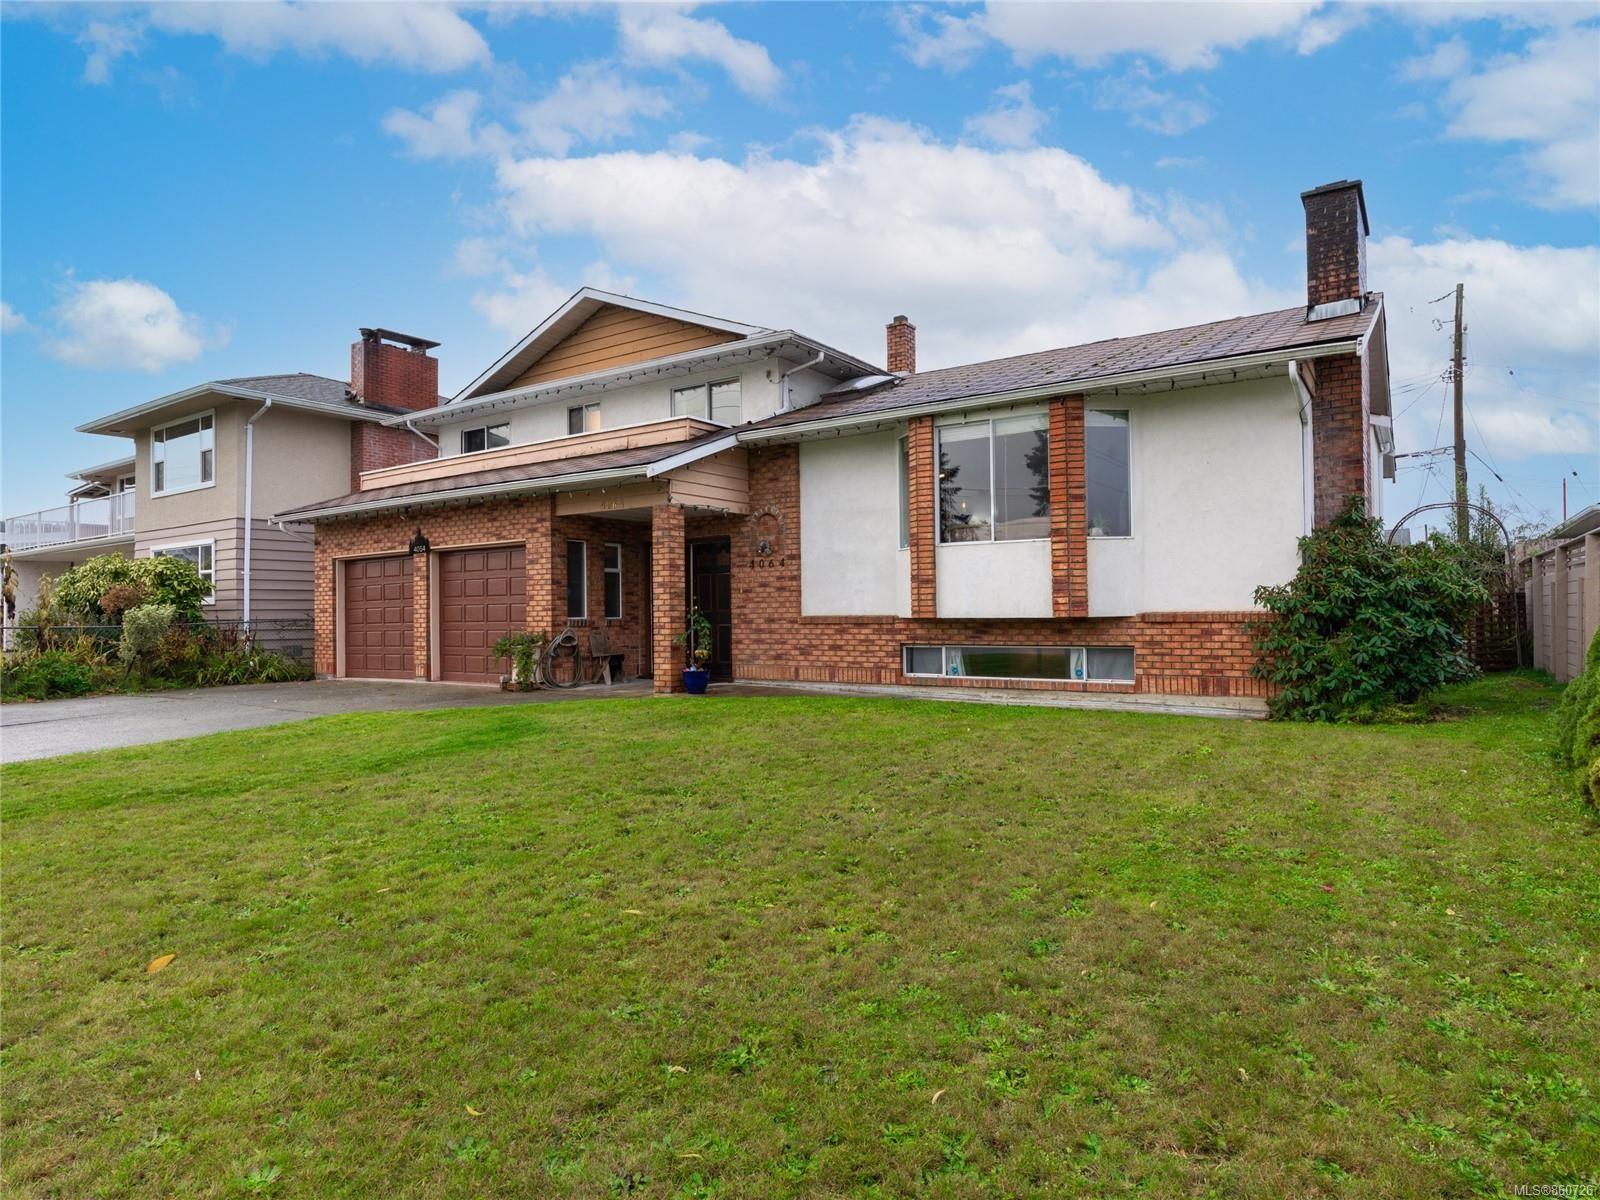 Main Photo: 4064 Wallace St in : PA Port Alberni House for sale (Port Alberni)  : MLS®# 860726